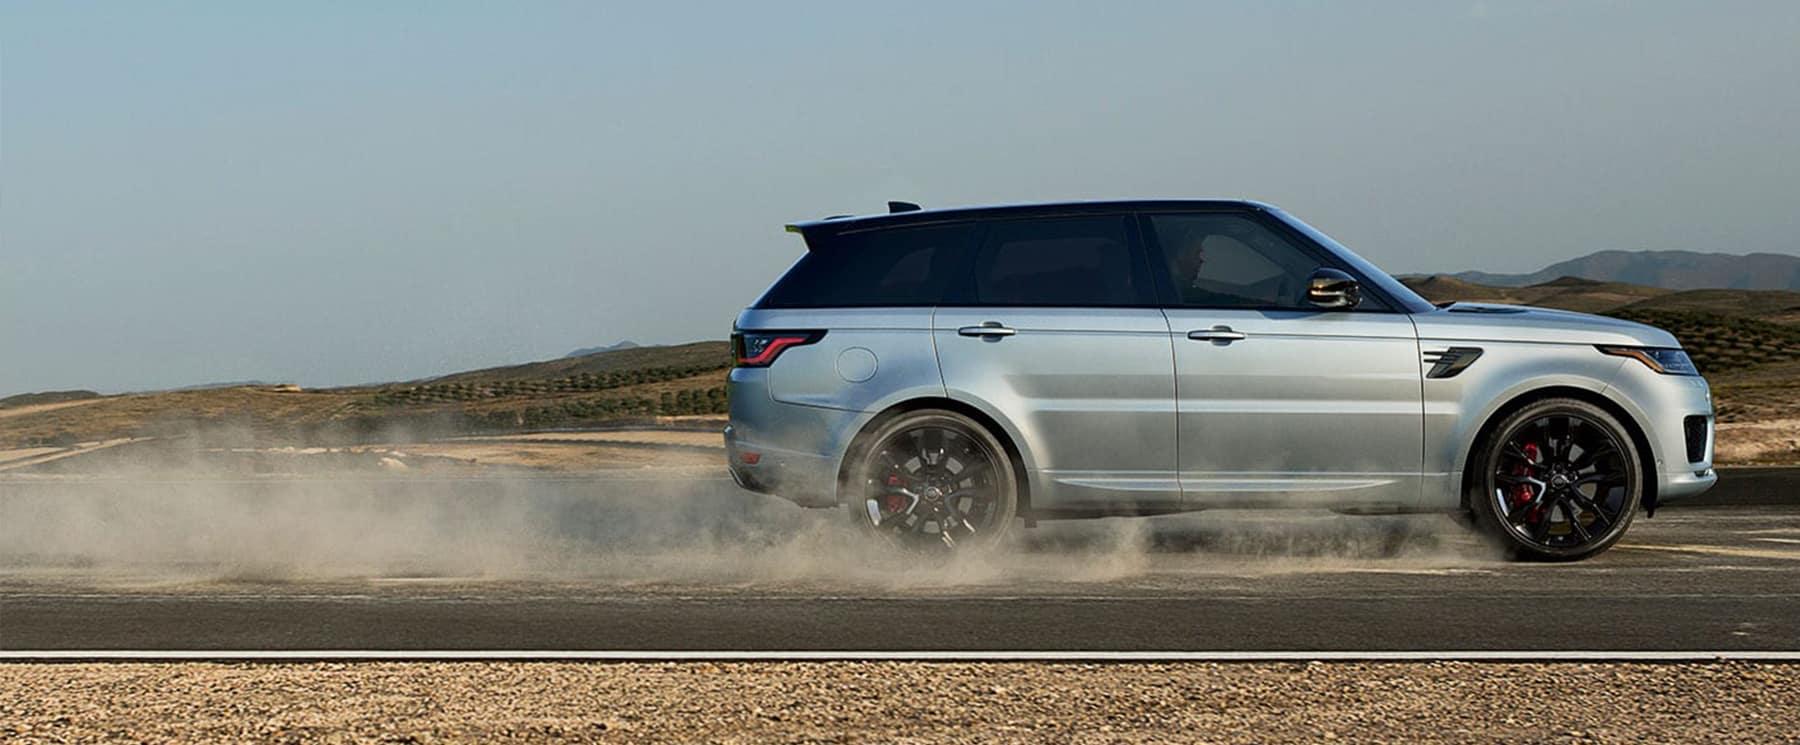 2020 Land Rover Range Rover Sport: Changes, Equipment, Price >> 2020 Range Rover Sport Svr Vs 2019 Porsche Cayenne Turbo Ky